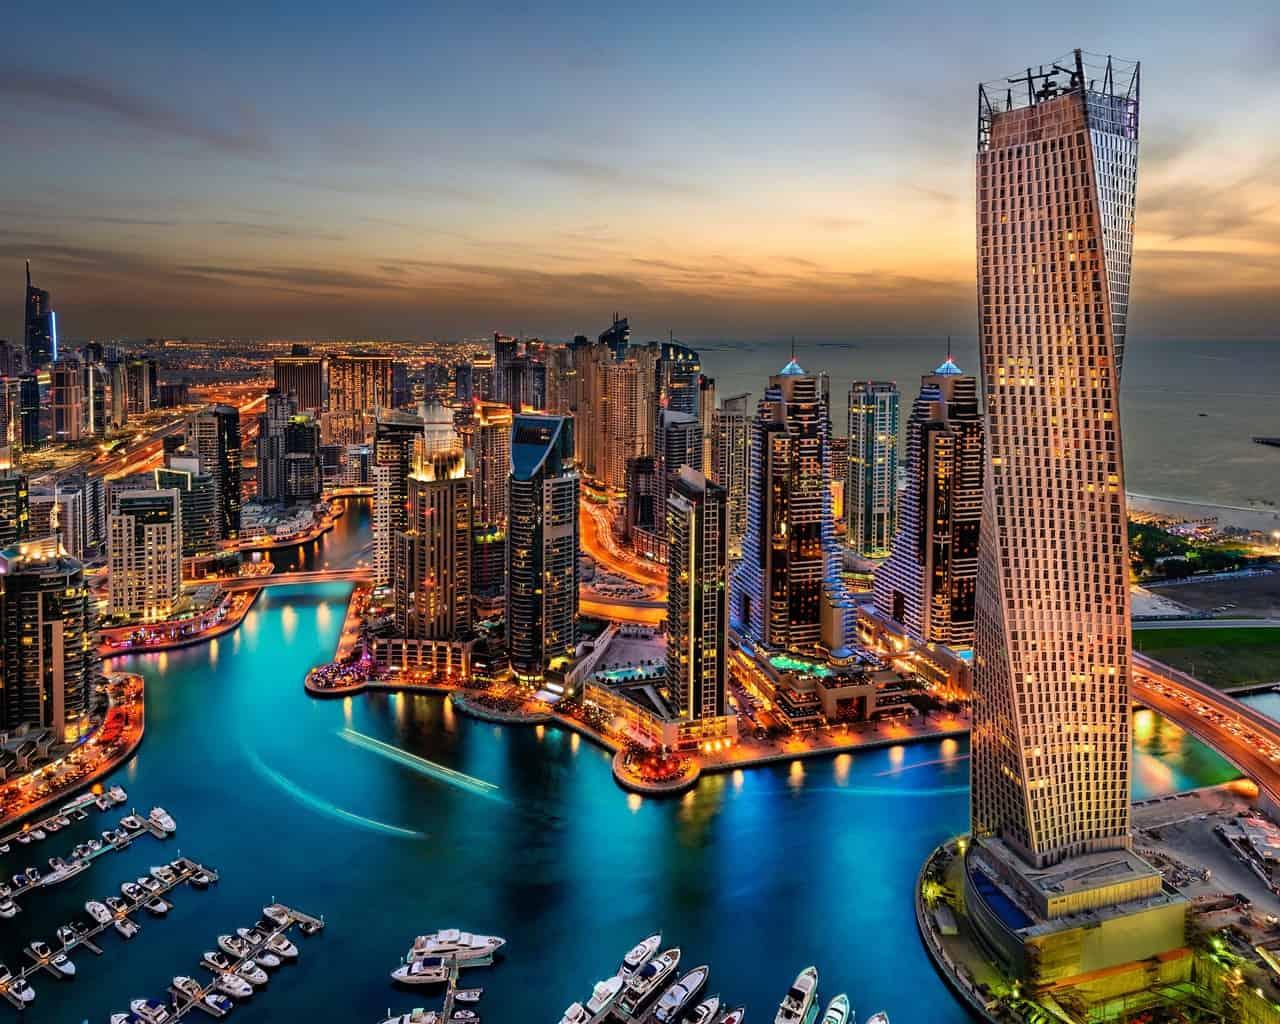 أماكن لازم تزورها في دبي